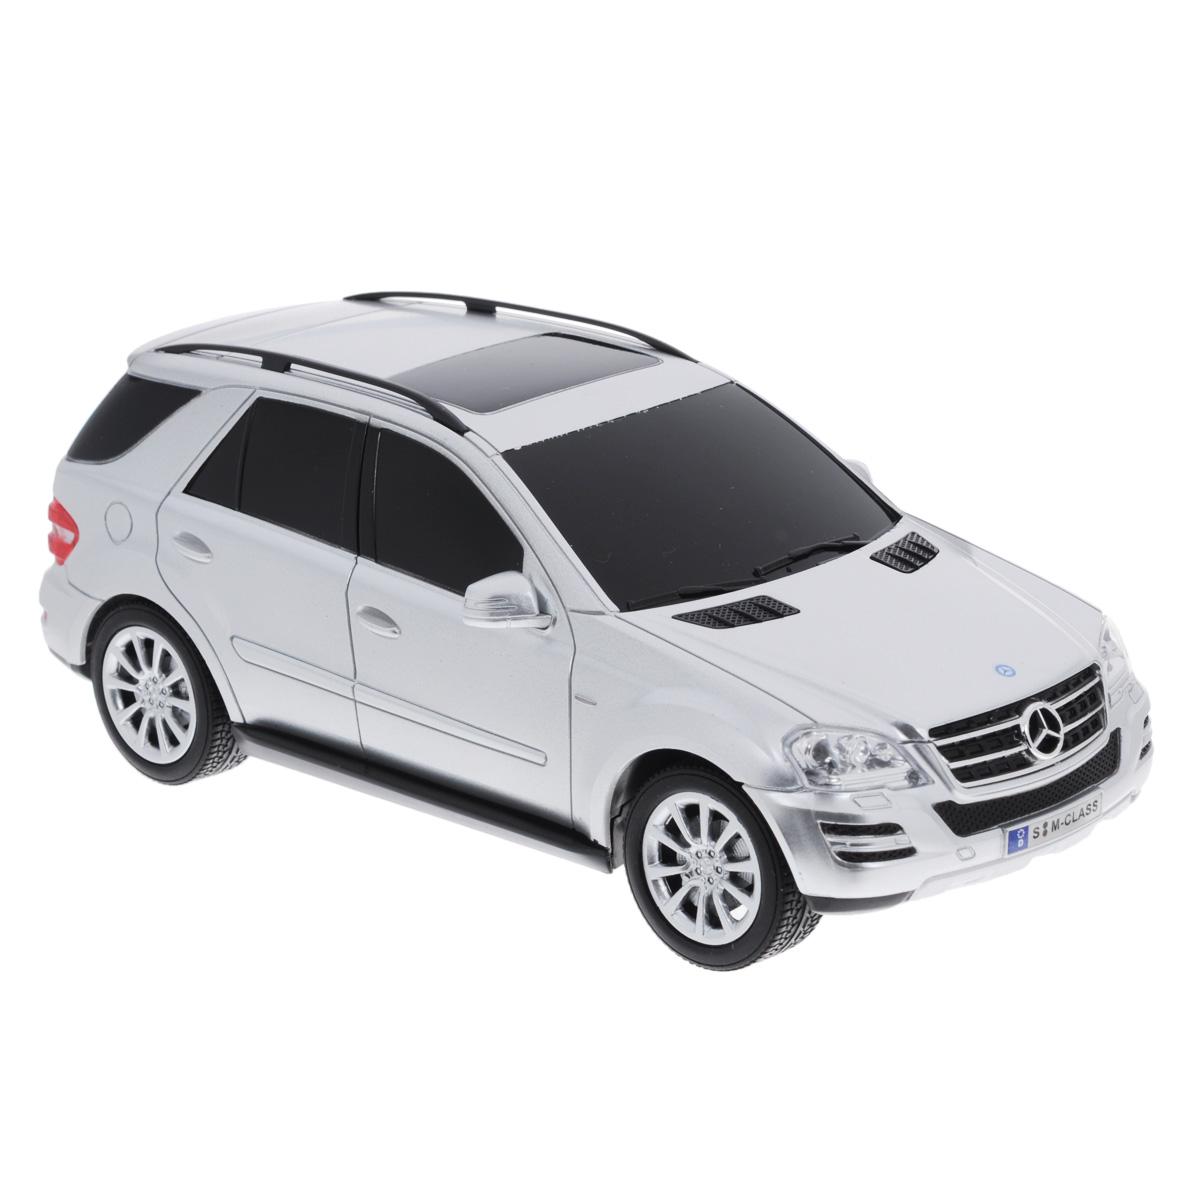 Topgear for Mercedes benz m350